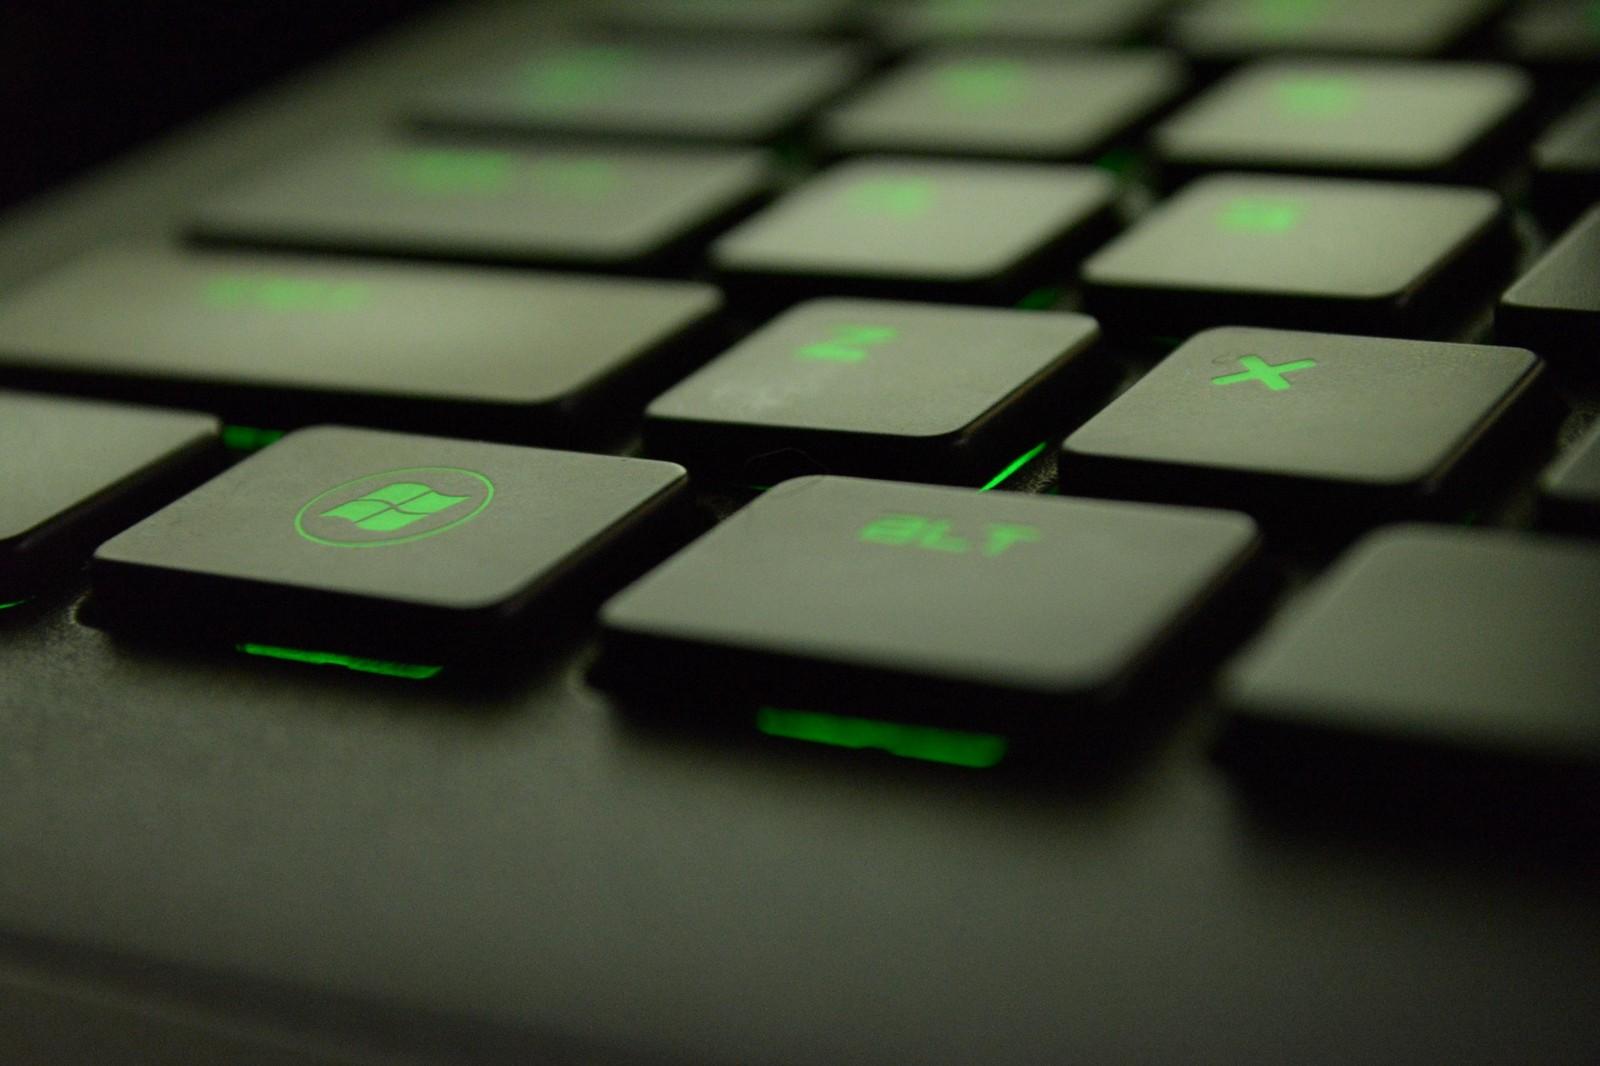 /the-microsoft-laptop-anomaly-eeb07486230b feature image